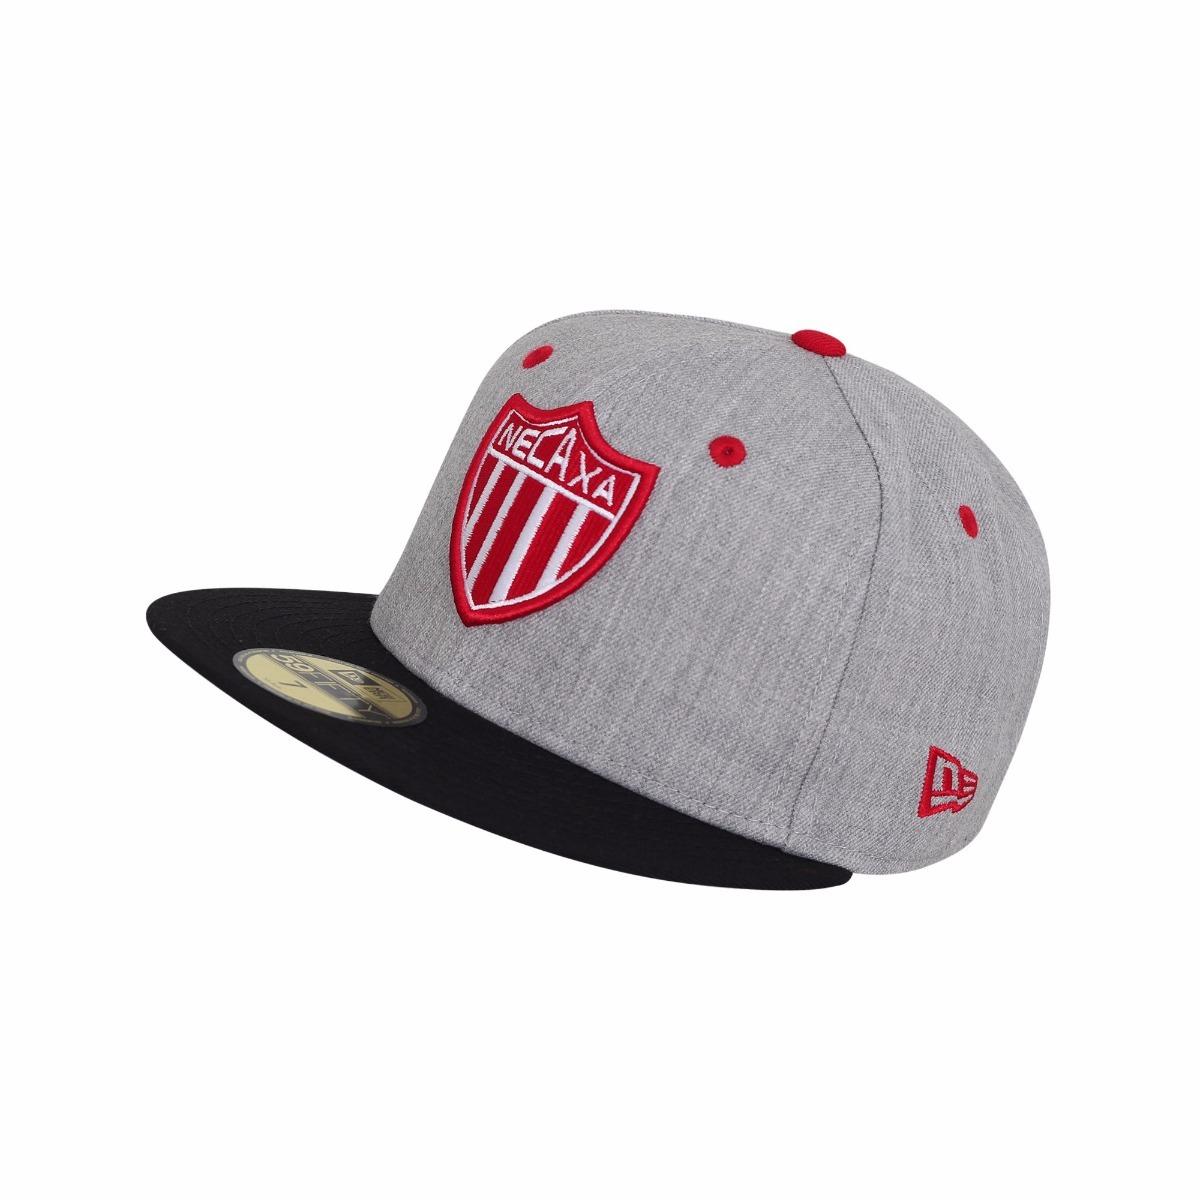 Gorra New Era Futbol 59fifty Necaxa - Gris -   599.00 en Mercado Libre c21edd7a62f